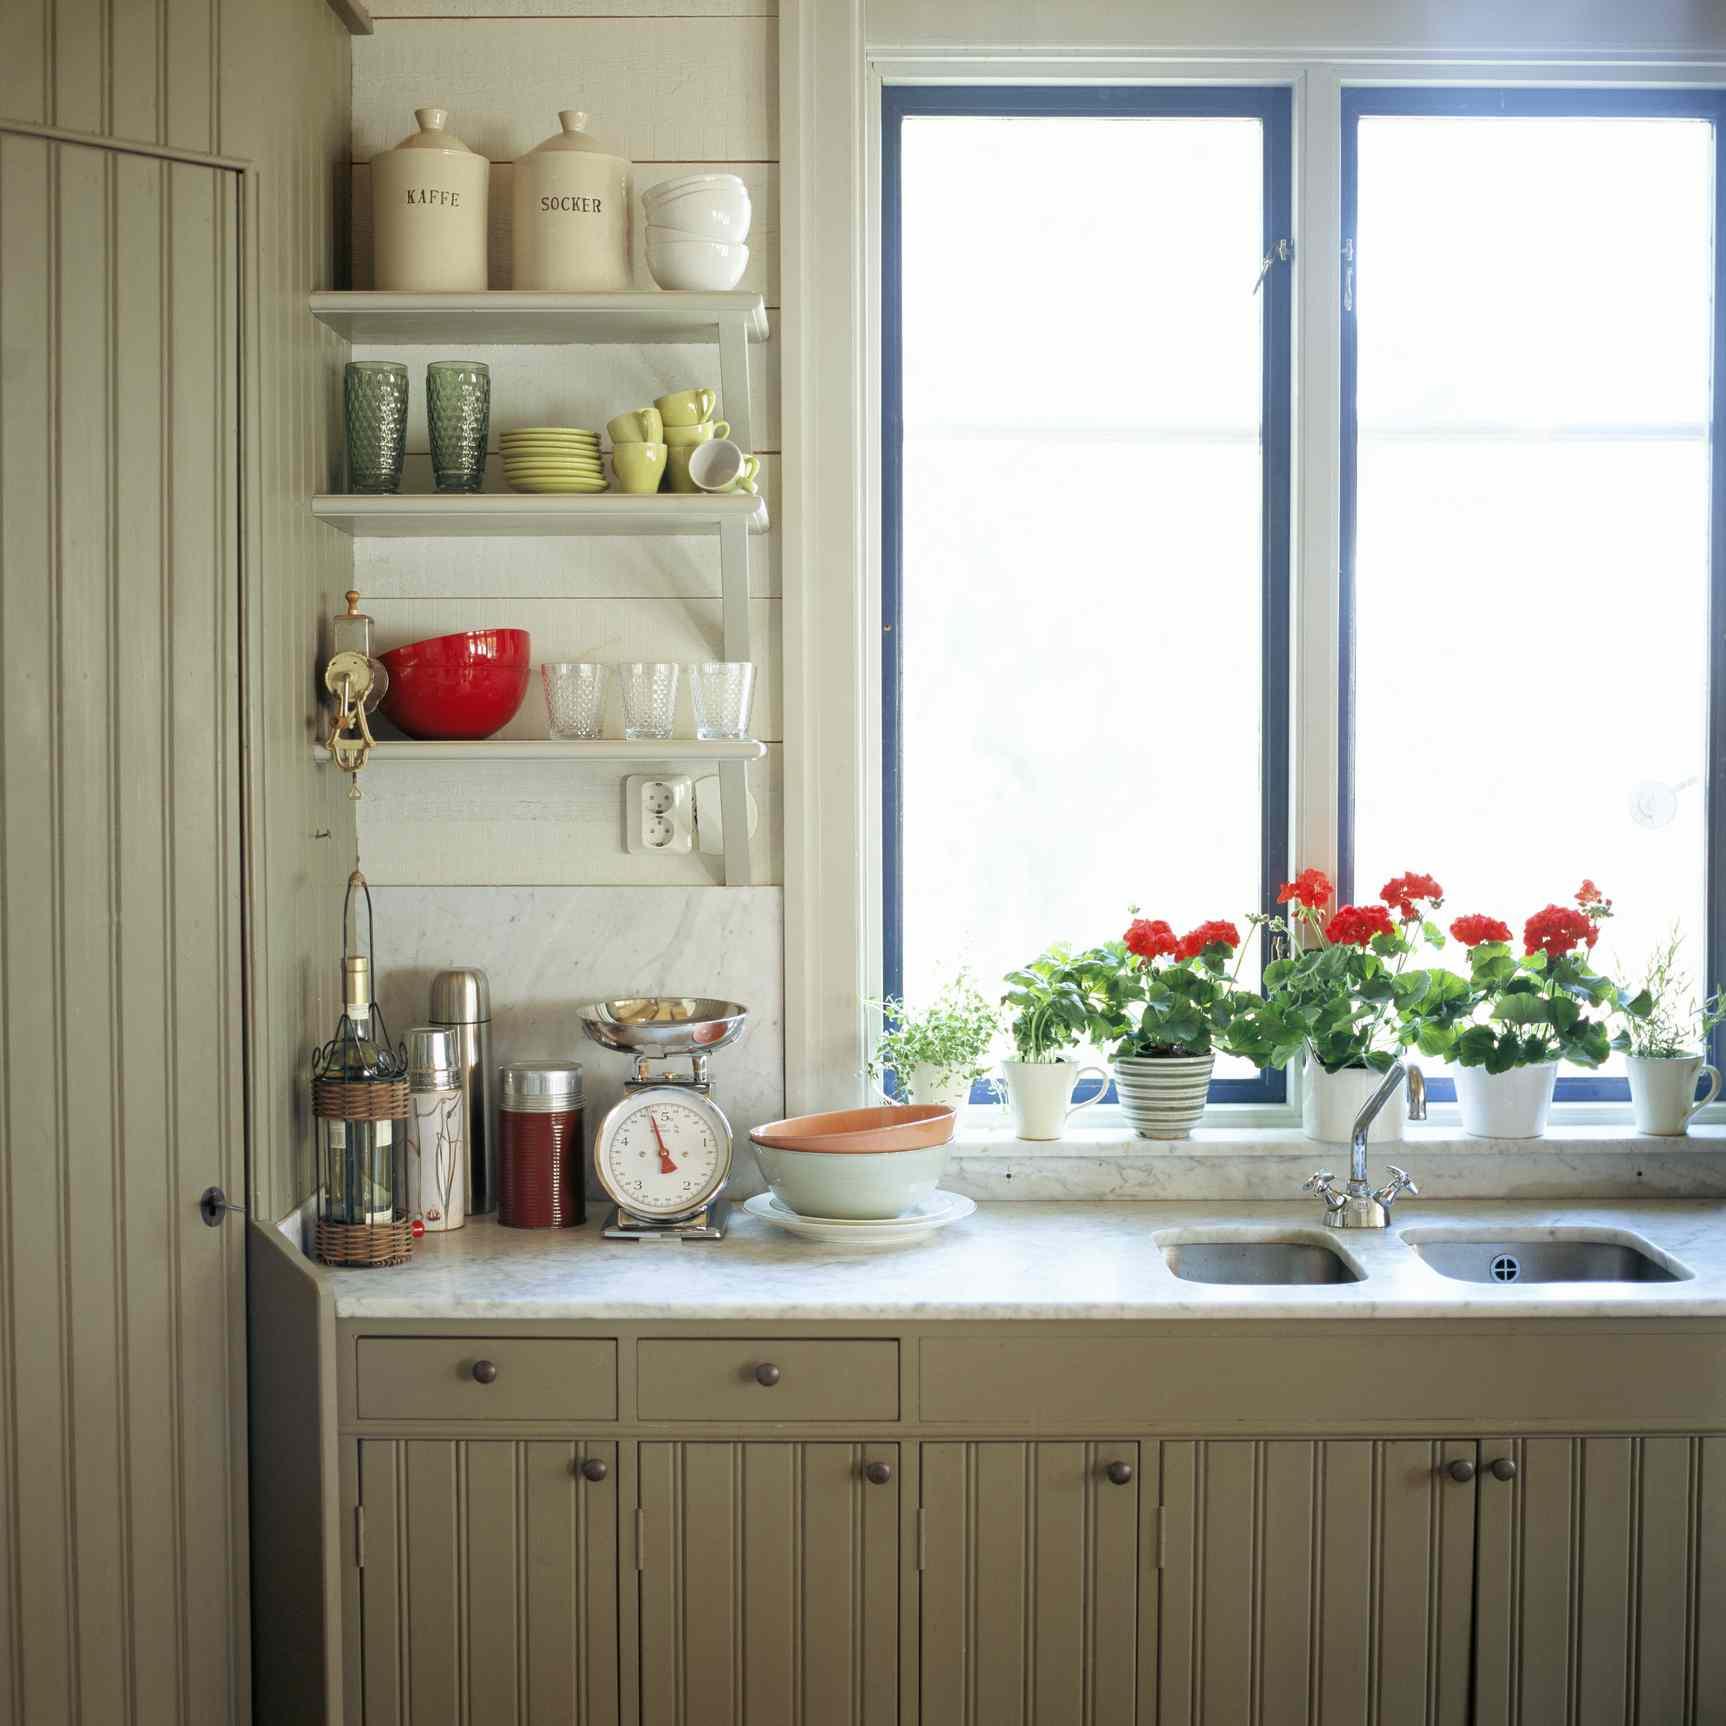 red geranium plants in front of kitchen windowsill